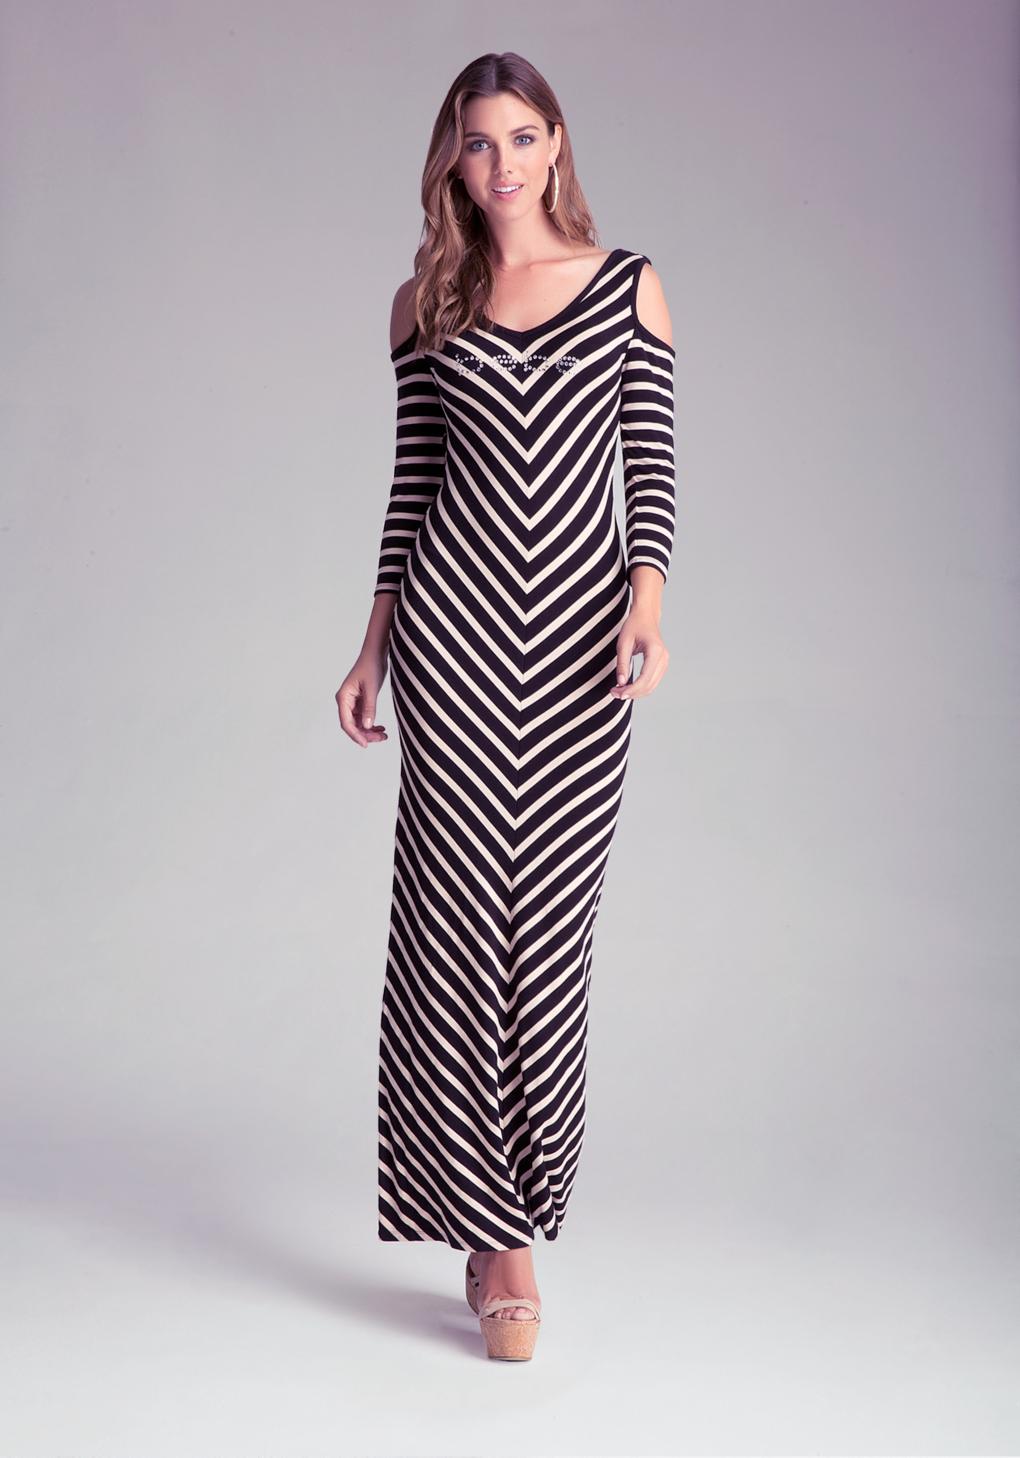 Lyst - Bebe Cold Shoulder Chevron Dress In Black